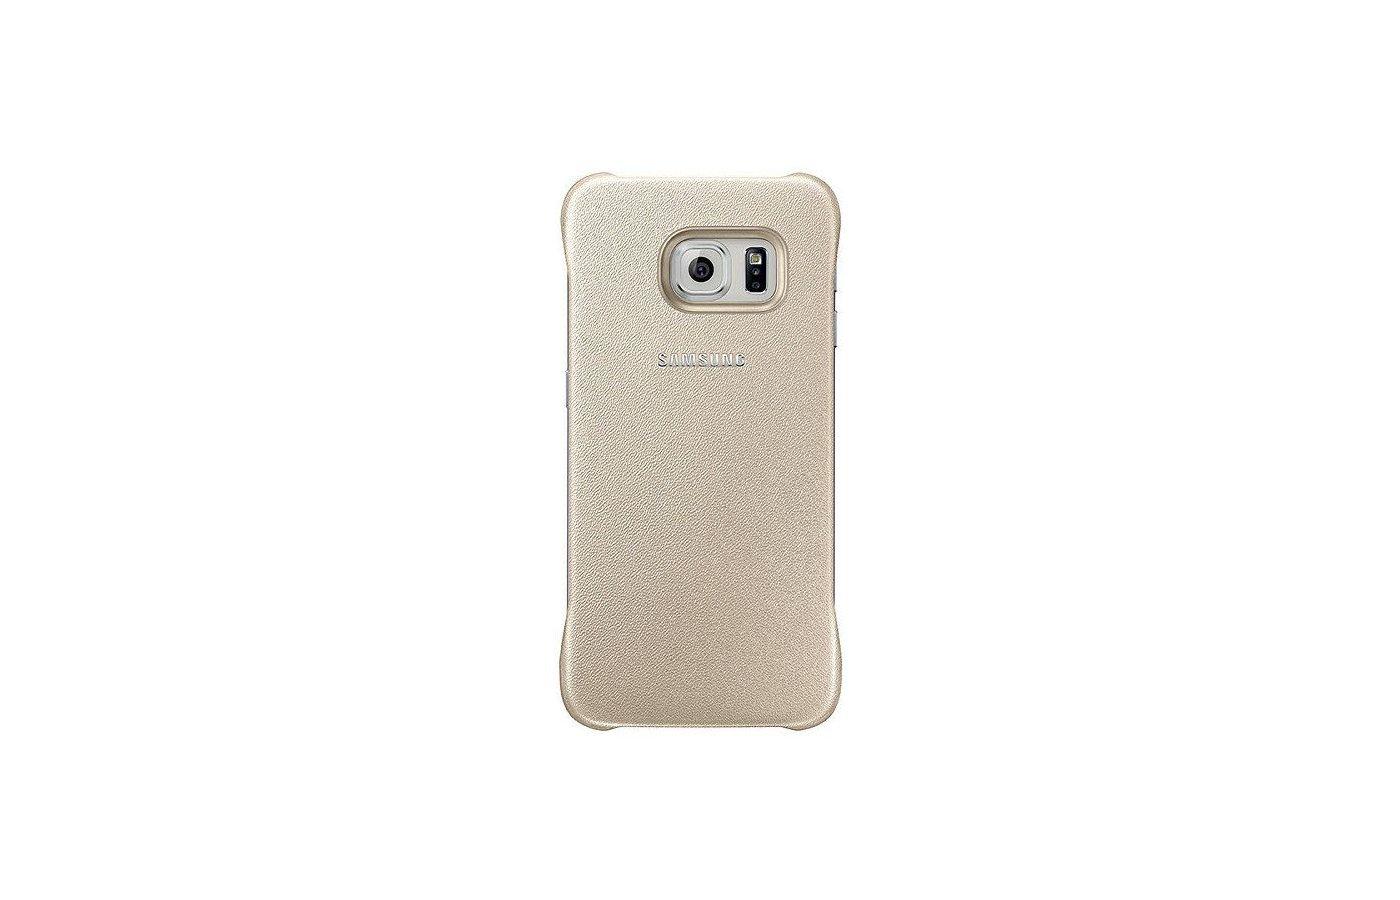 Чехол Samsung Protective Cover для Galaxy S6 Edge (SM-G925) (EF-YG925BFEGRU) gold